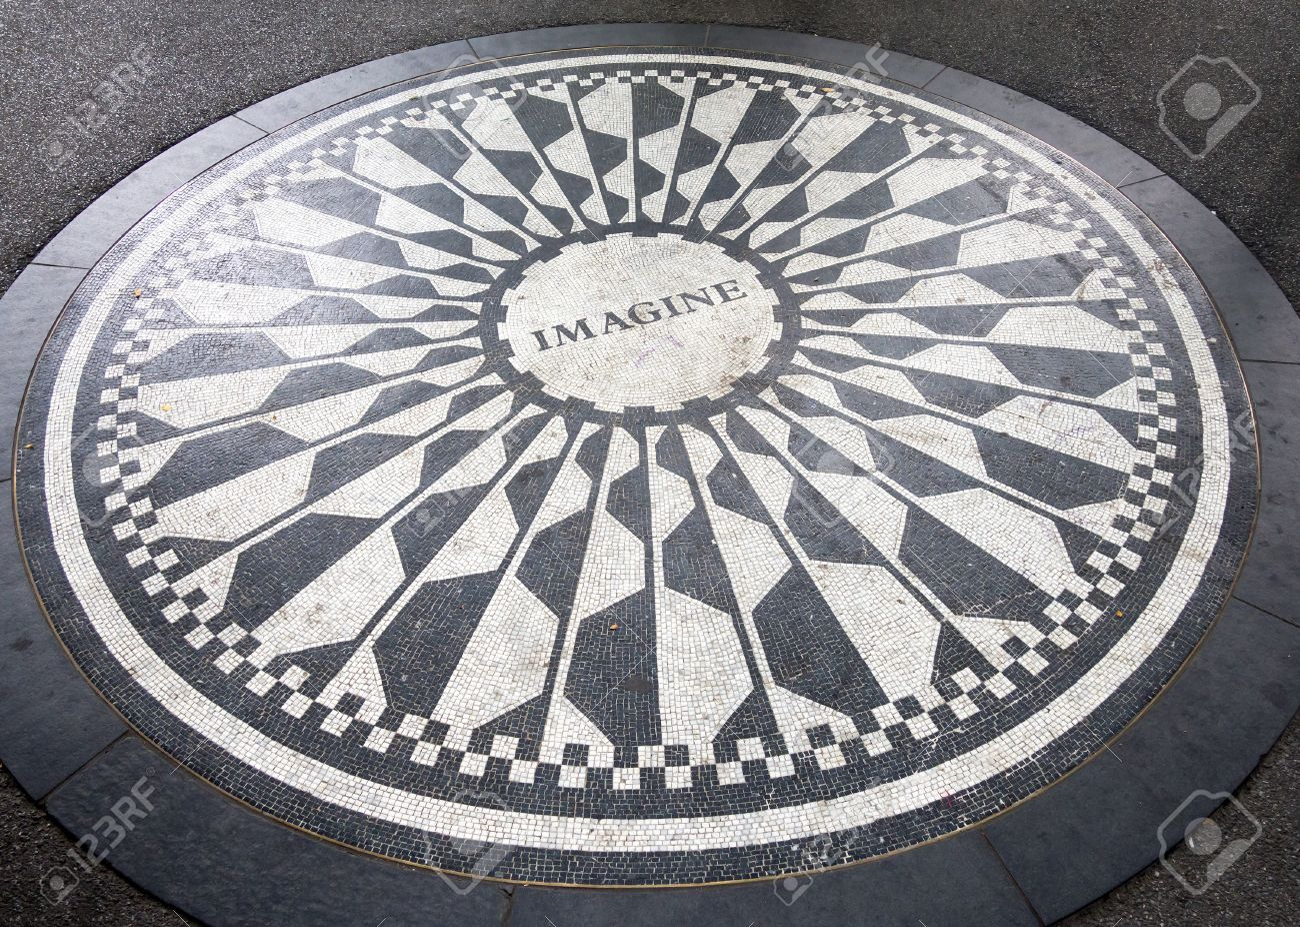 The imagine mosaic dedicated to john lennon at strawberry fields the imagine mosaic dedicated to john lennon at strawberry fields in central park new york buycottarizona